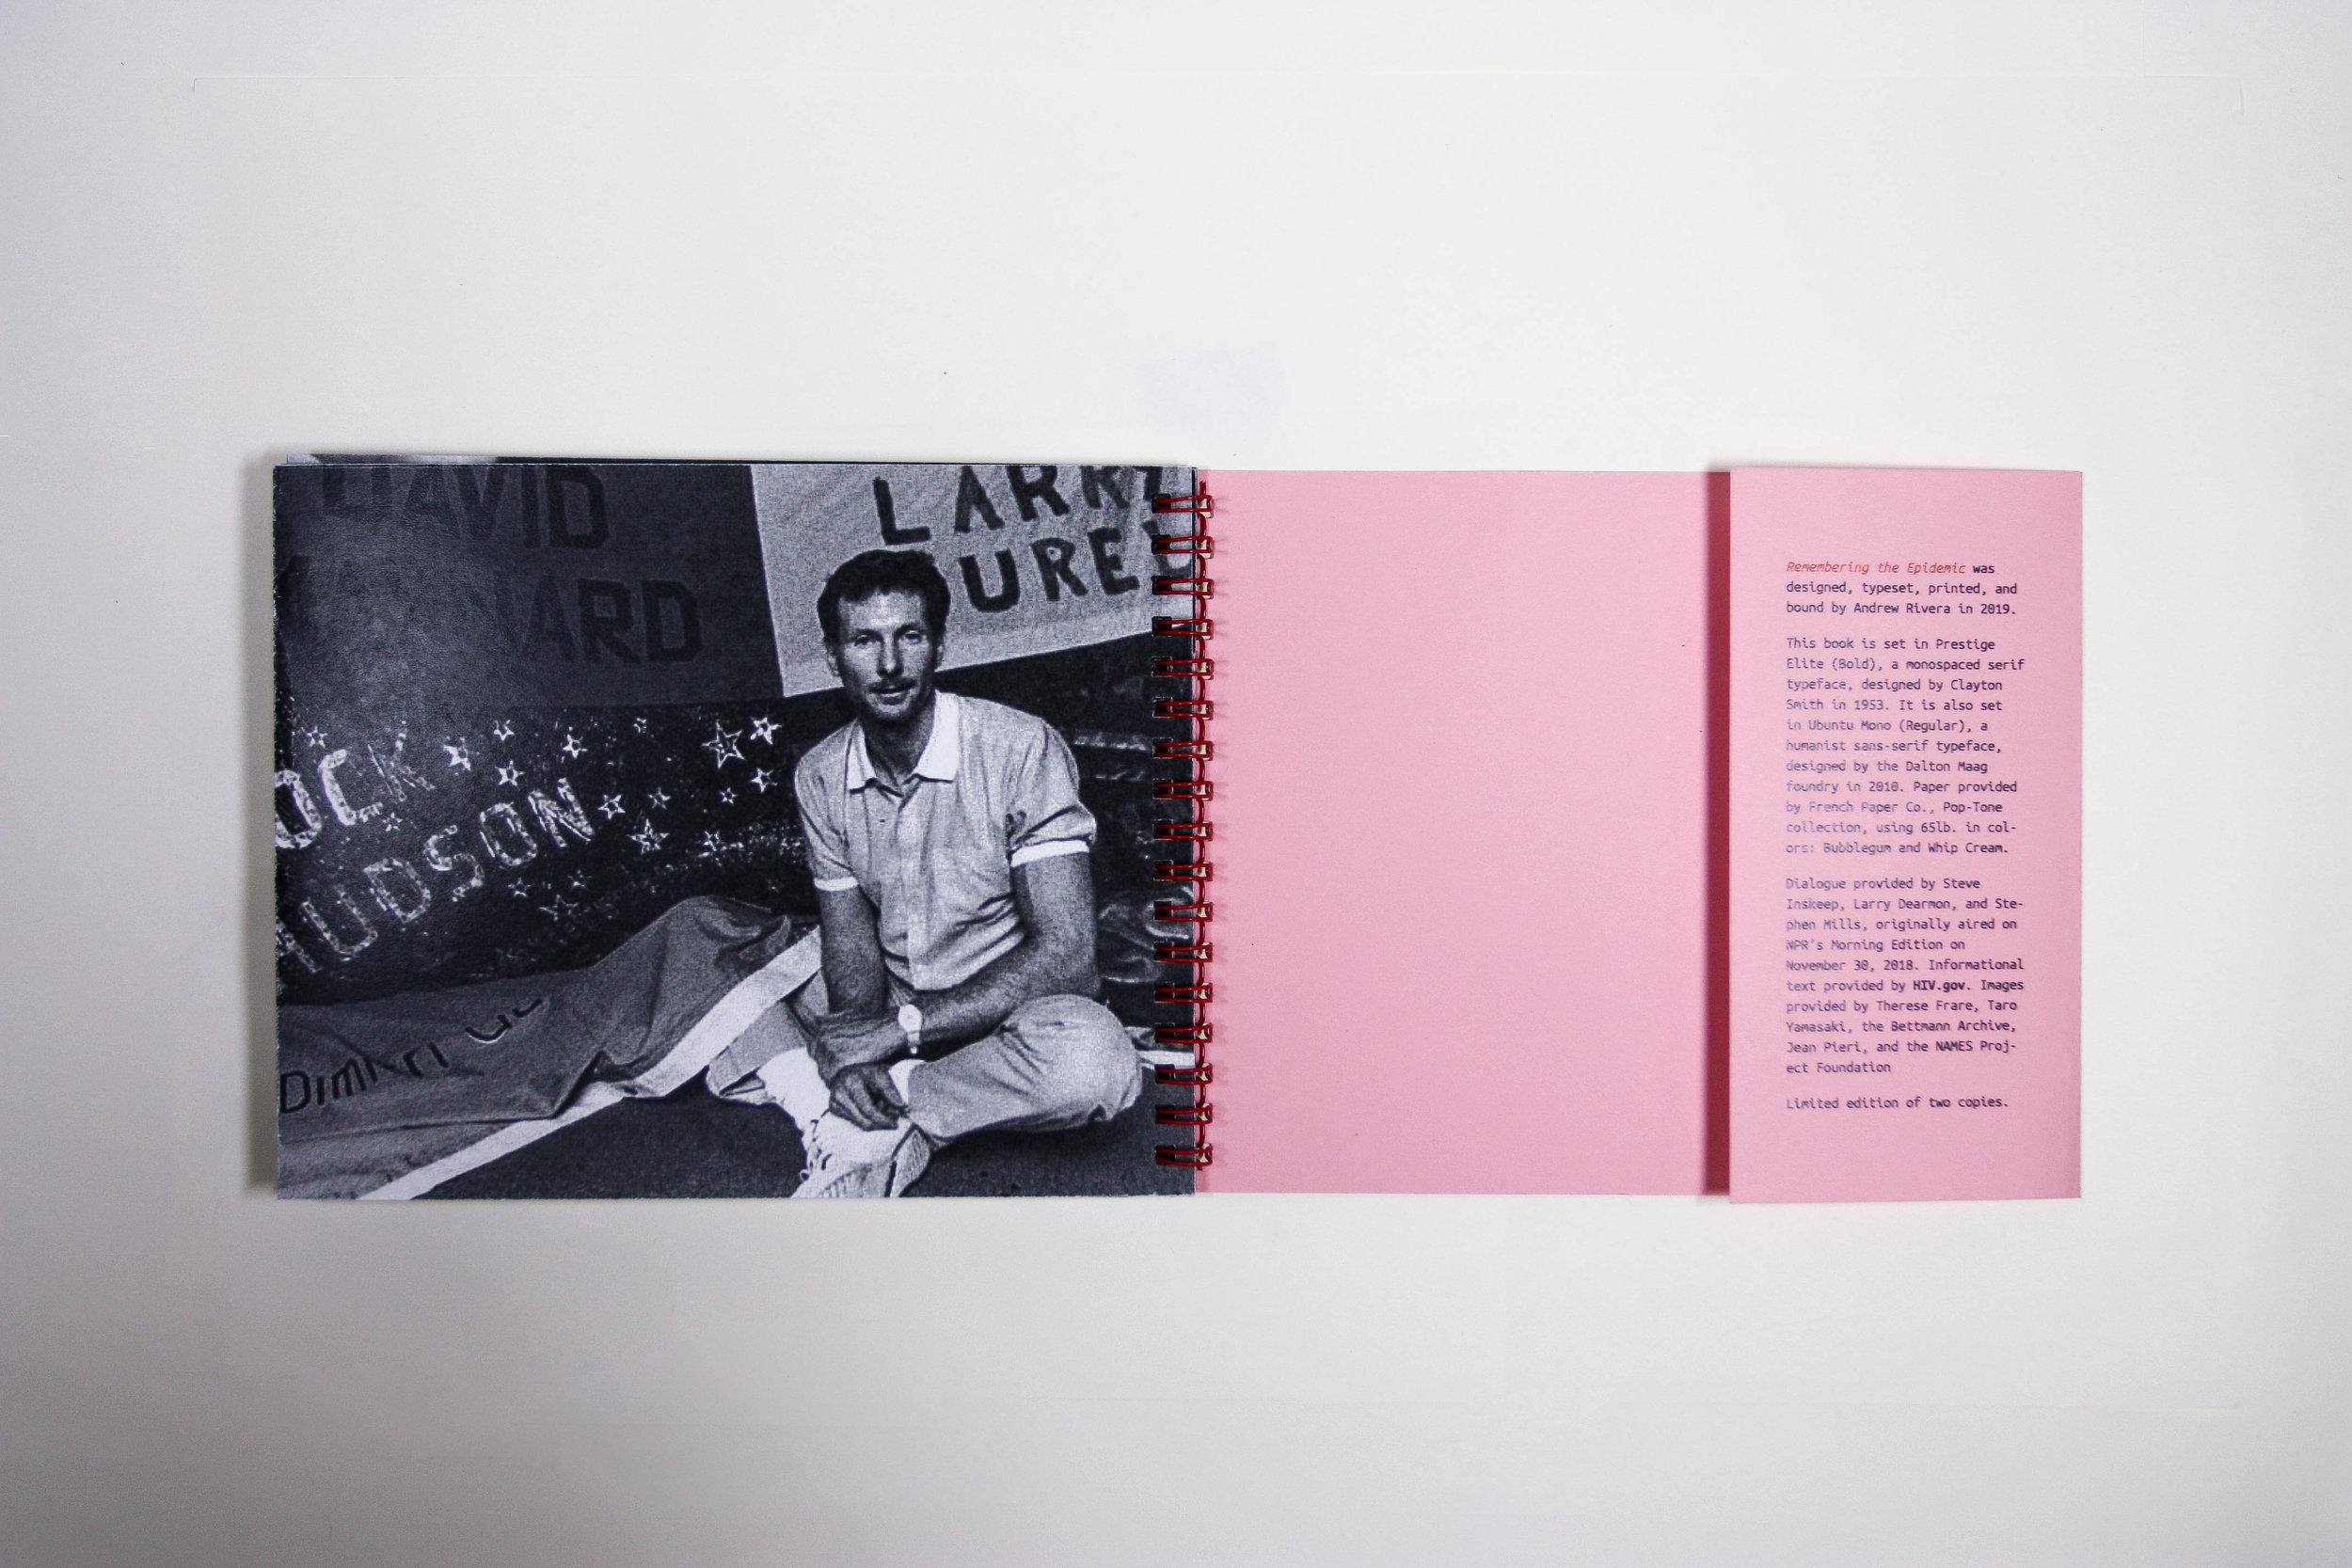 estory-bookimages-25.jpg